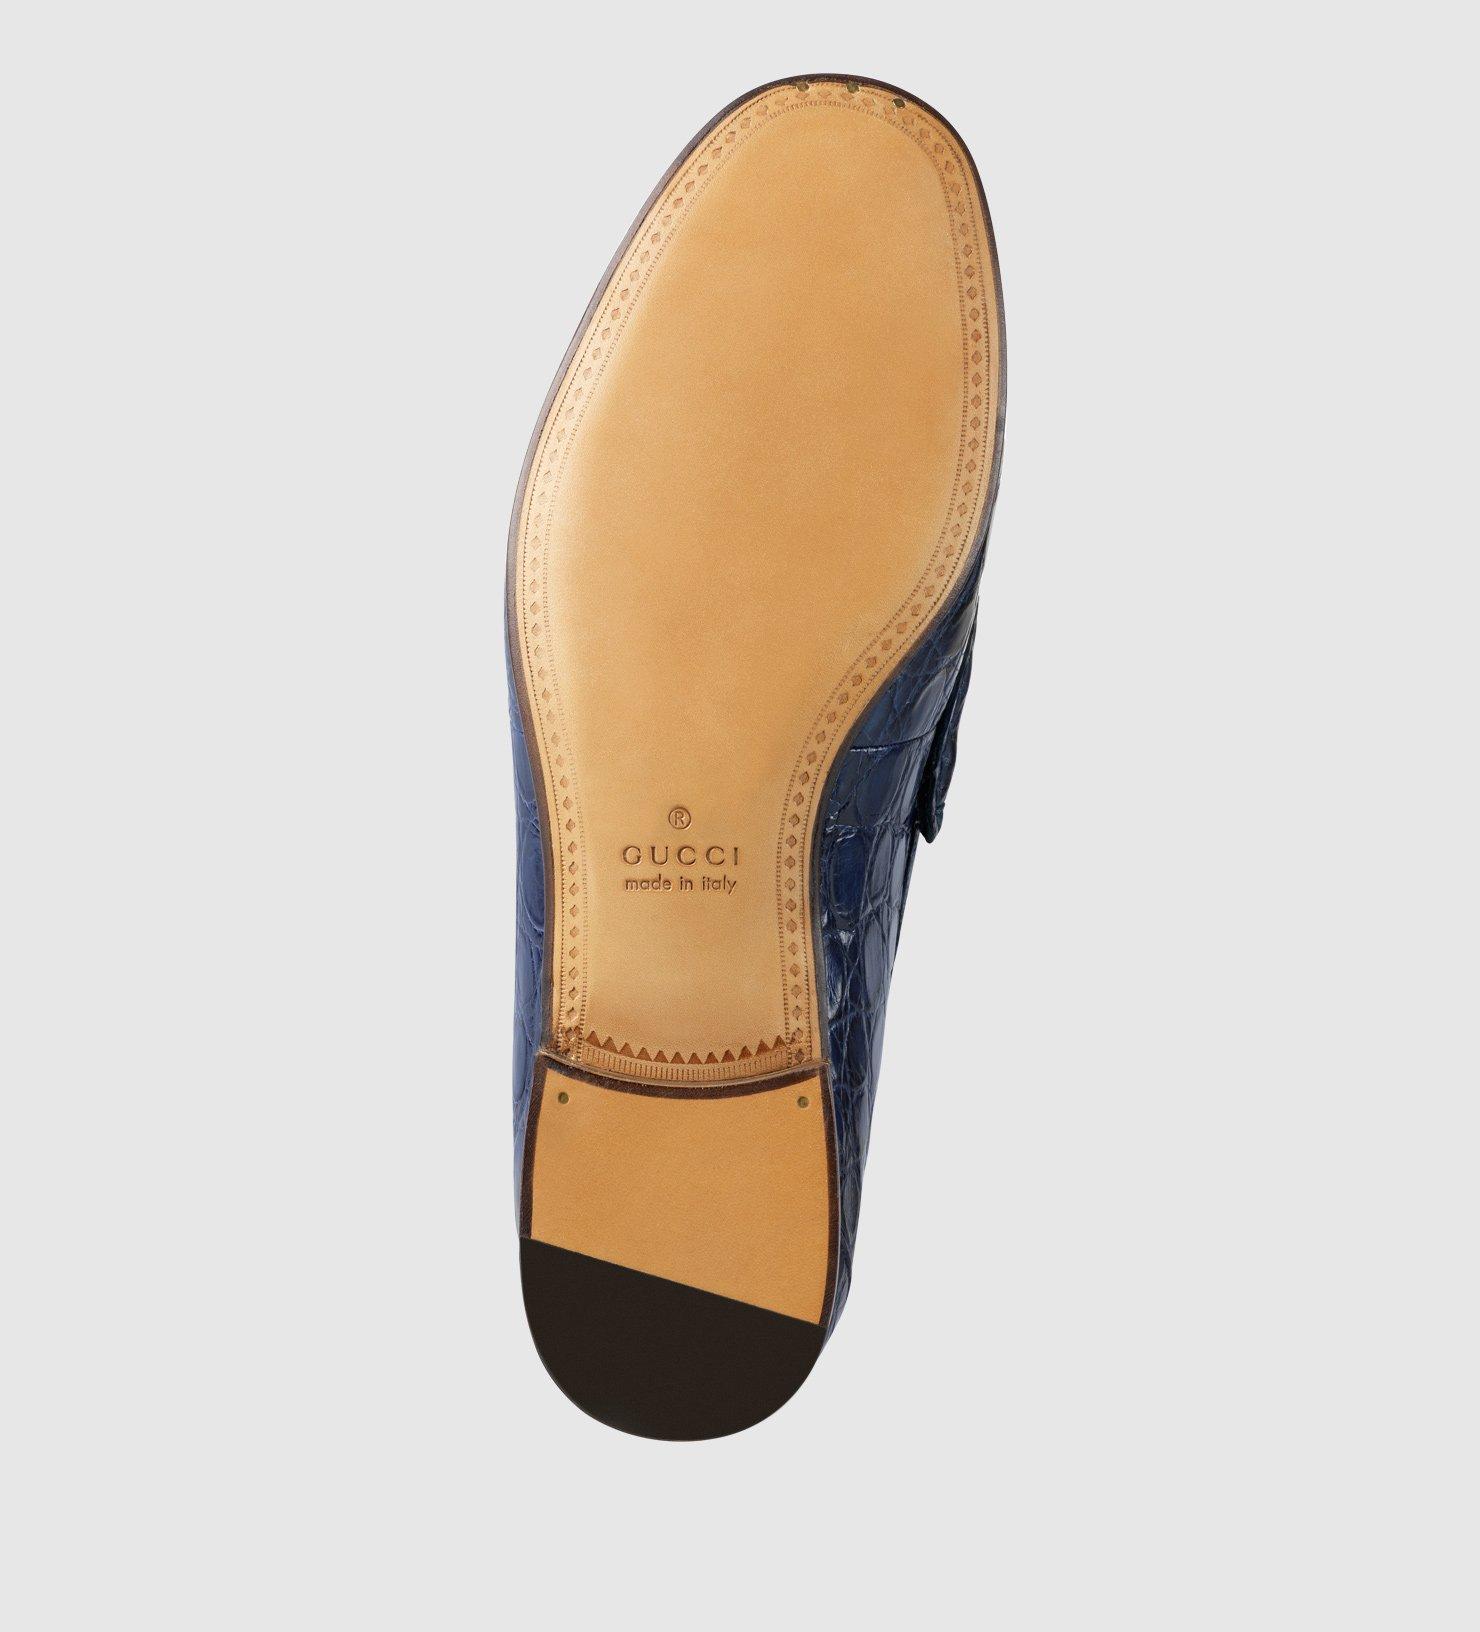 Crocodile-Embossed Calfskin Leather Belts,Genuine Leather Alligator Design B18D